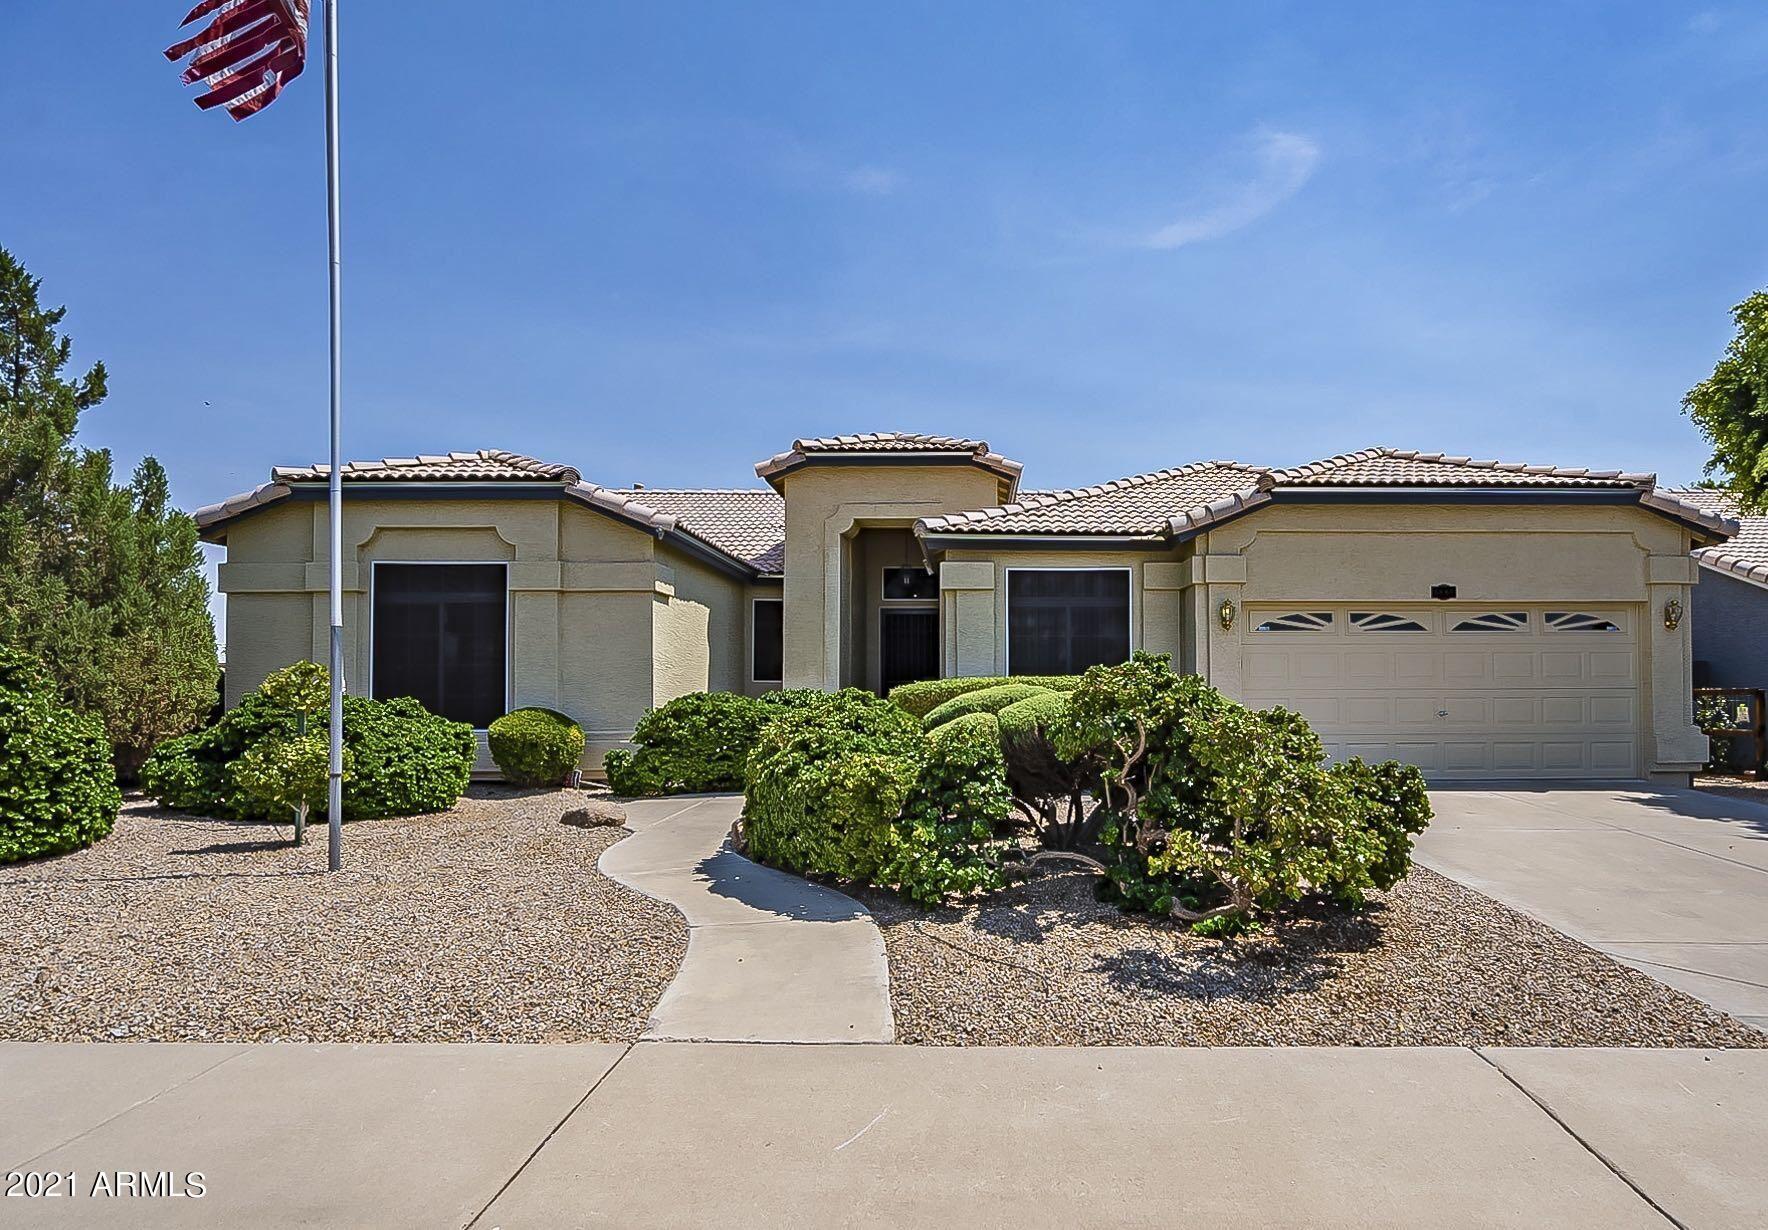 6661 E MENLO Street, Mesa, AZ 85215 - MLS#: 6250449